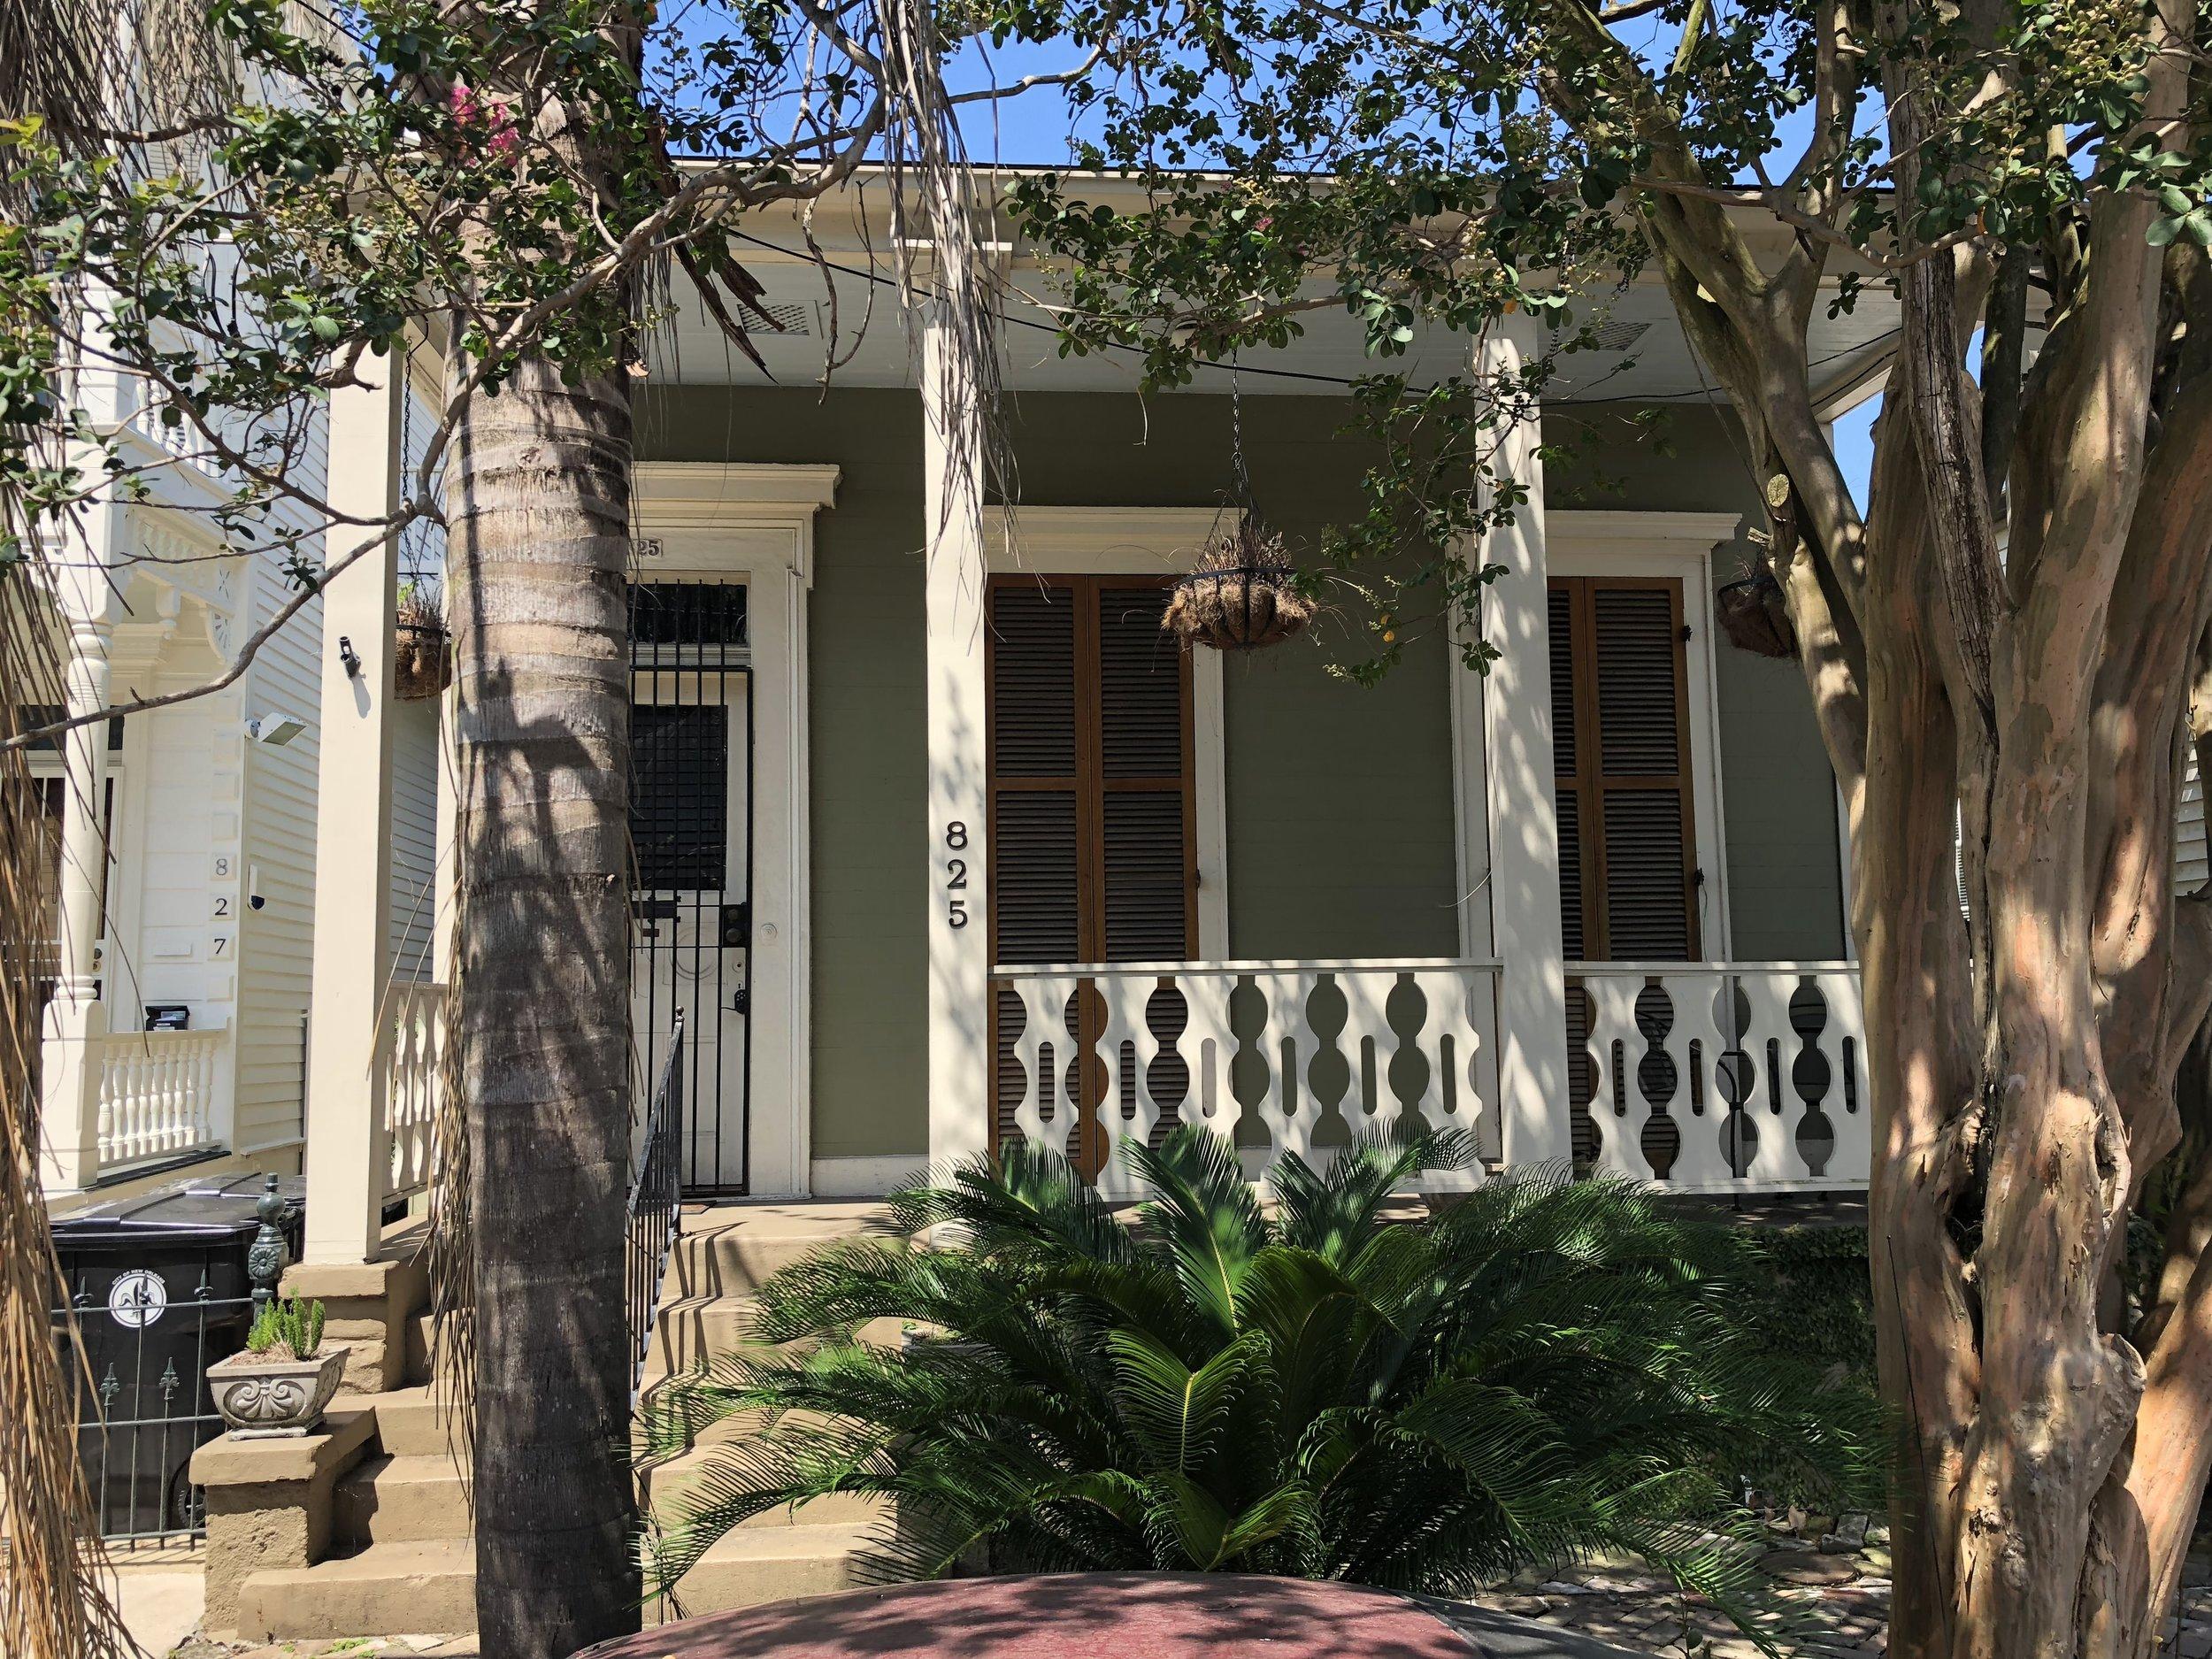 FOR LEASE: $2,400825 JACKSON AVE.new orleans, la - 2 bedrooms, 1 full bathroom, 1 half bathroom